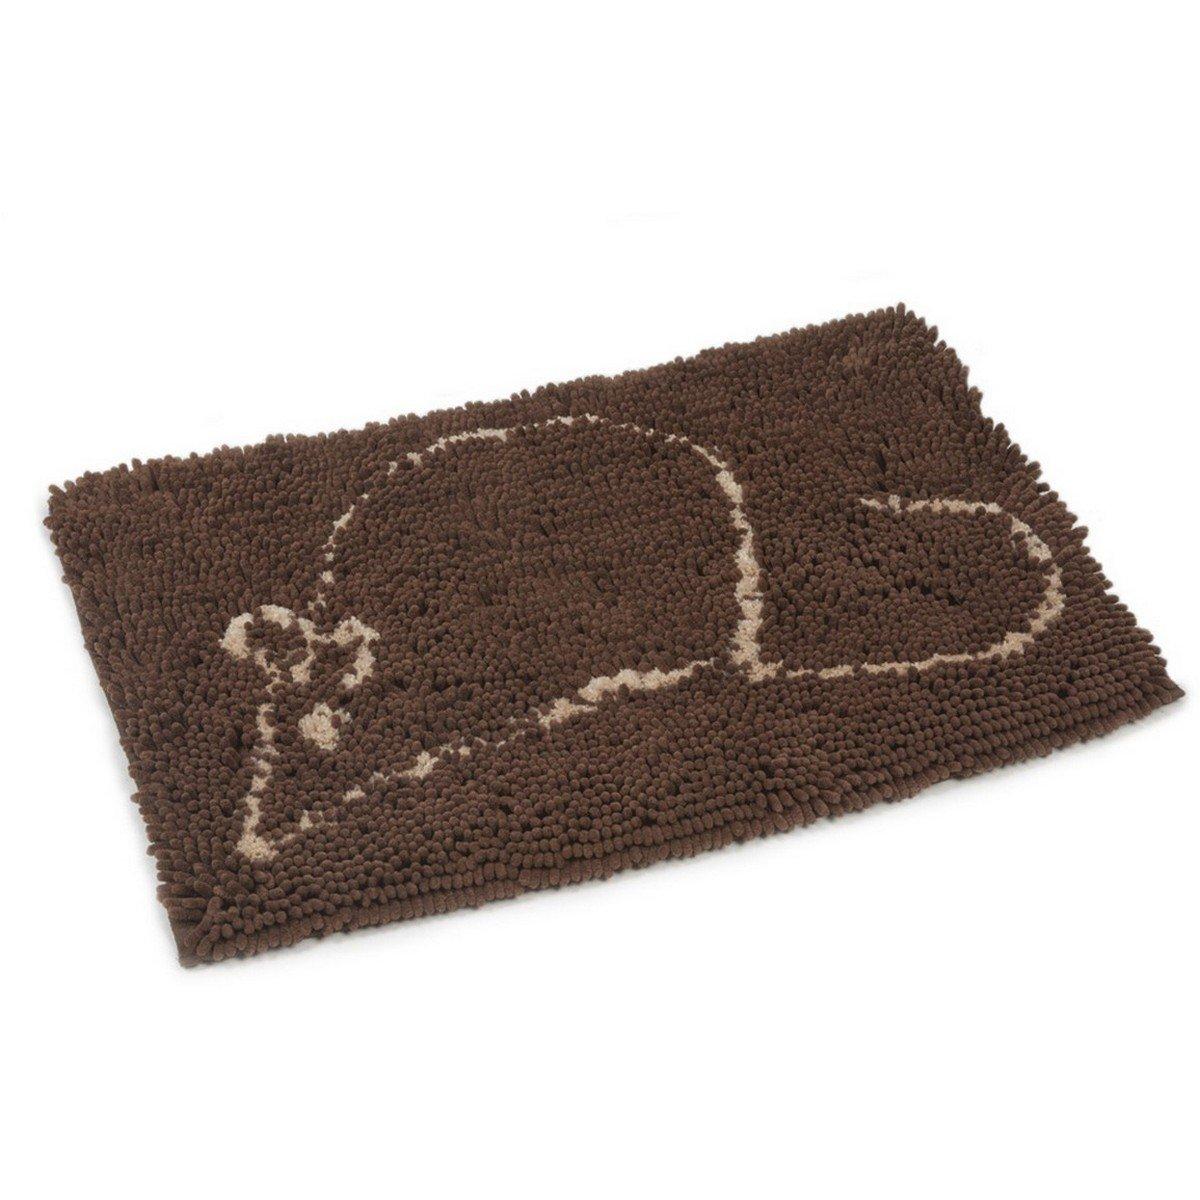 Afbeelding van Dirty Cat Droogloopmat Kleur: Bruin Afmeting: 58x41cm